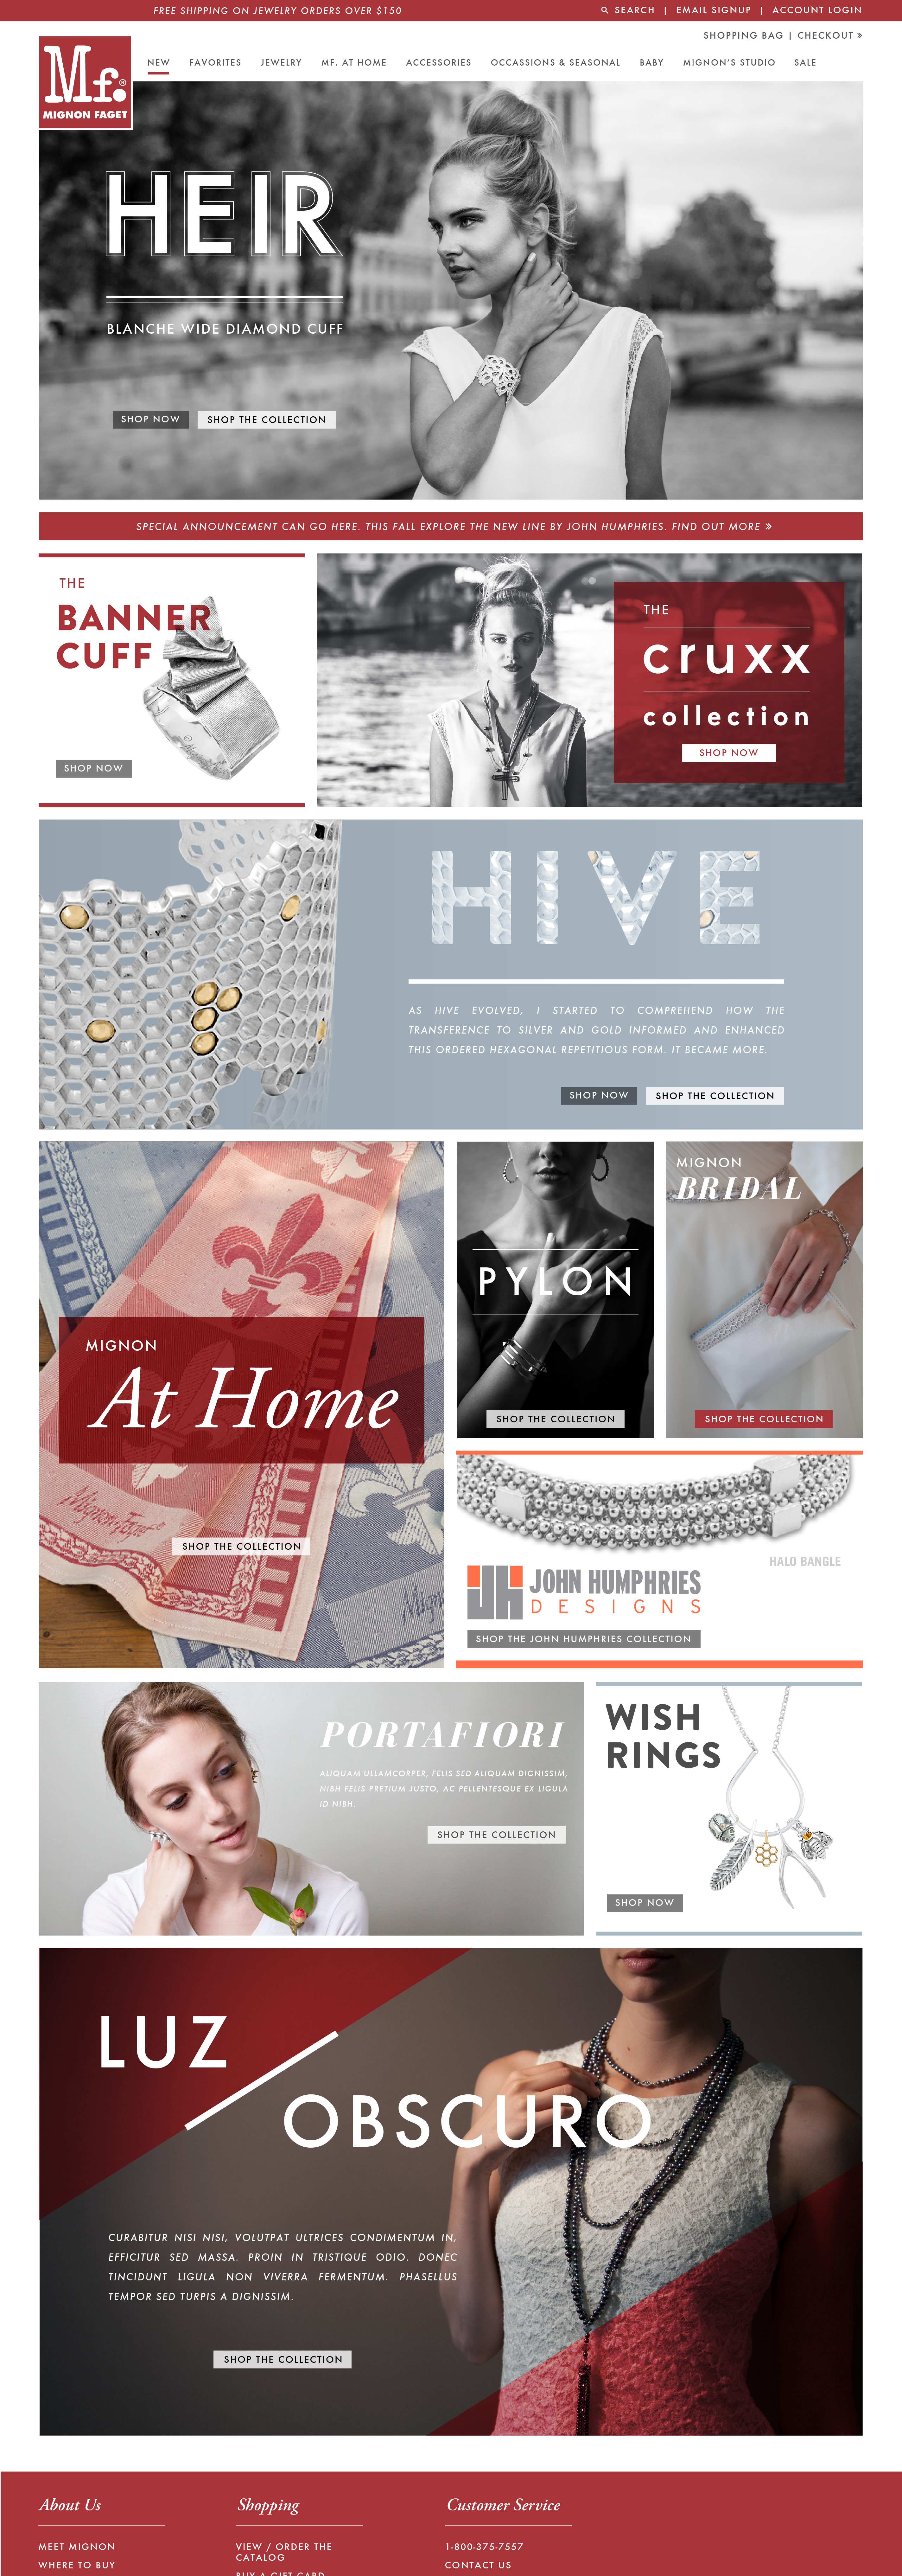 Mignon Faget Homepage Design